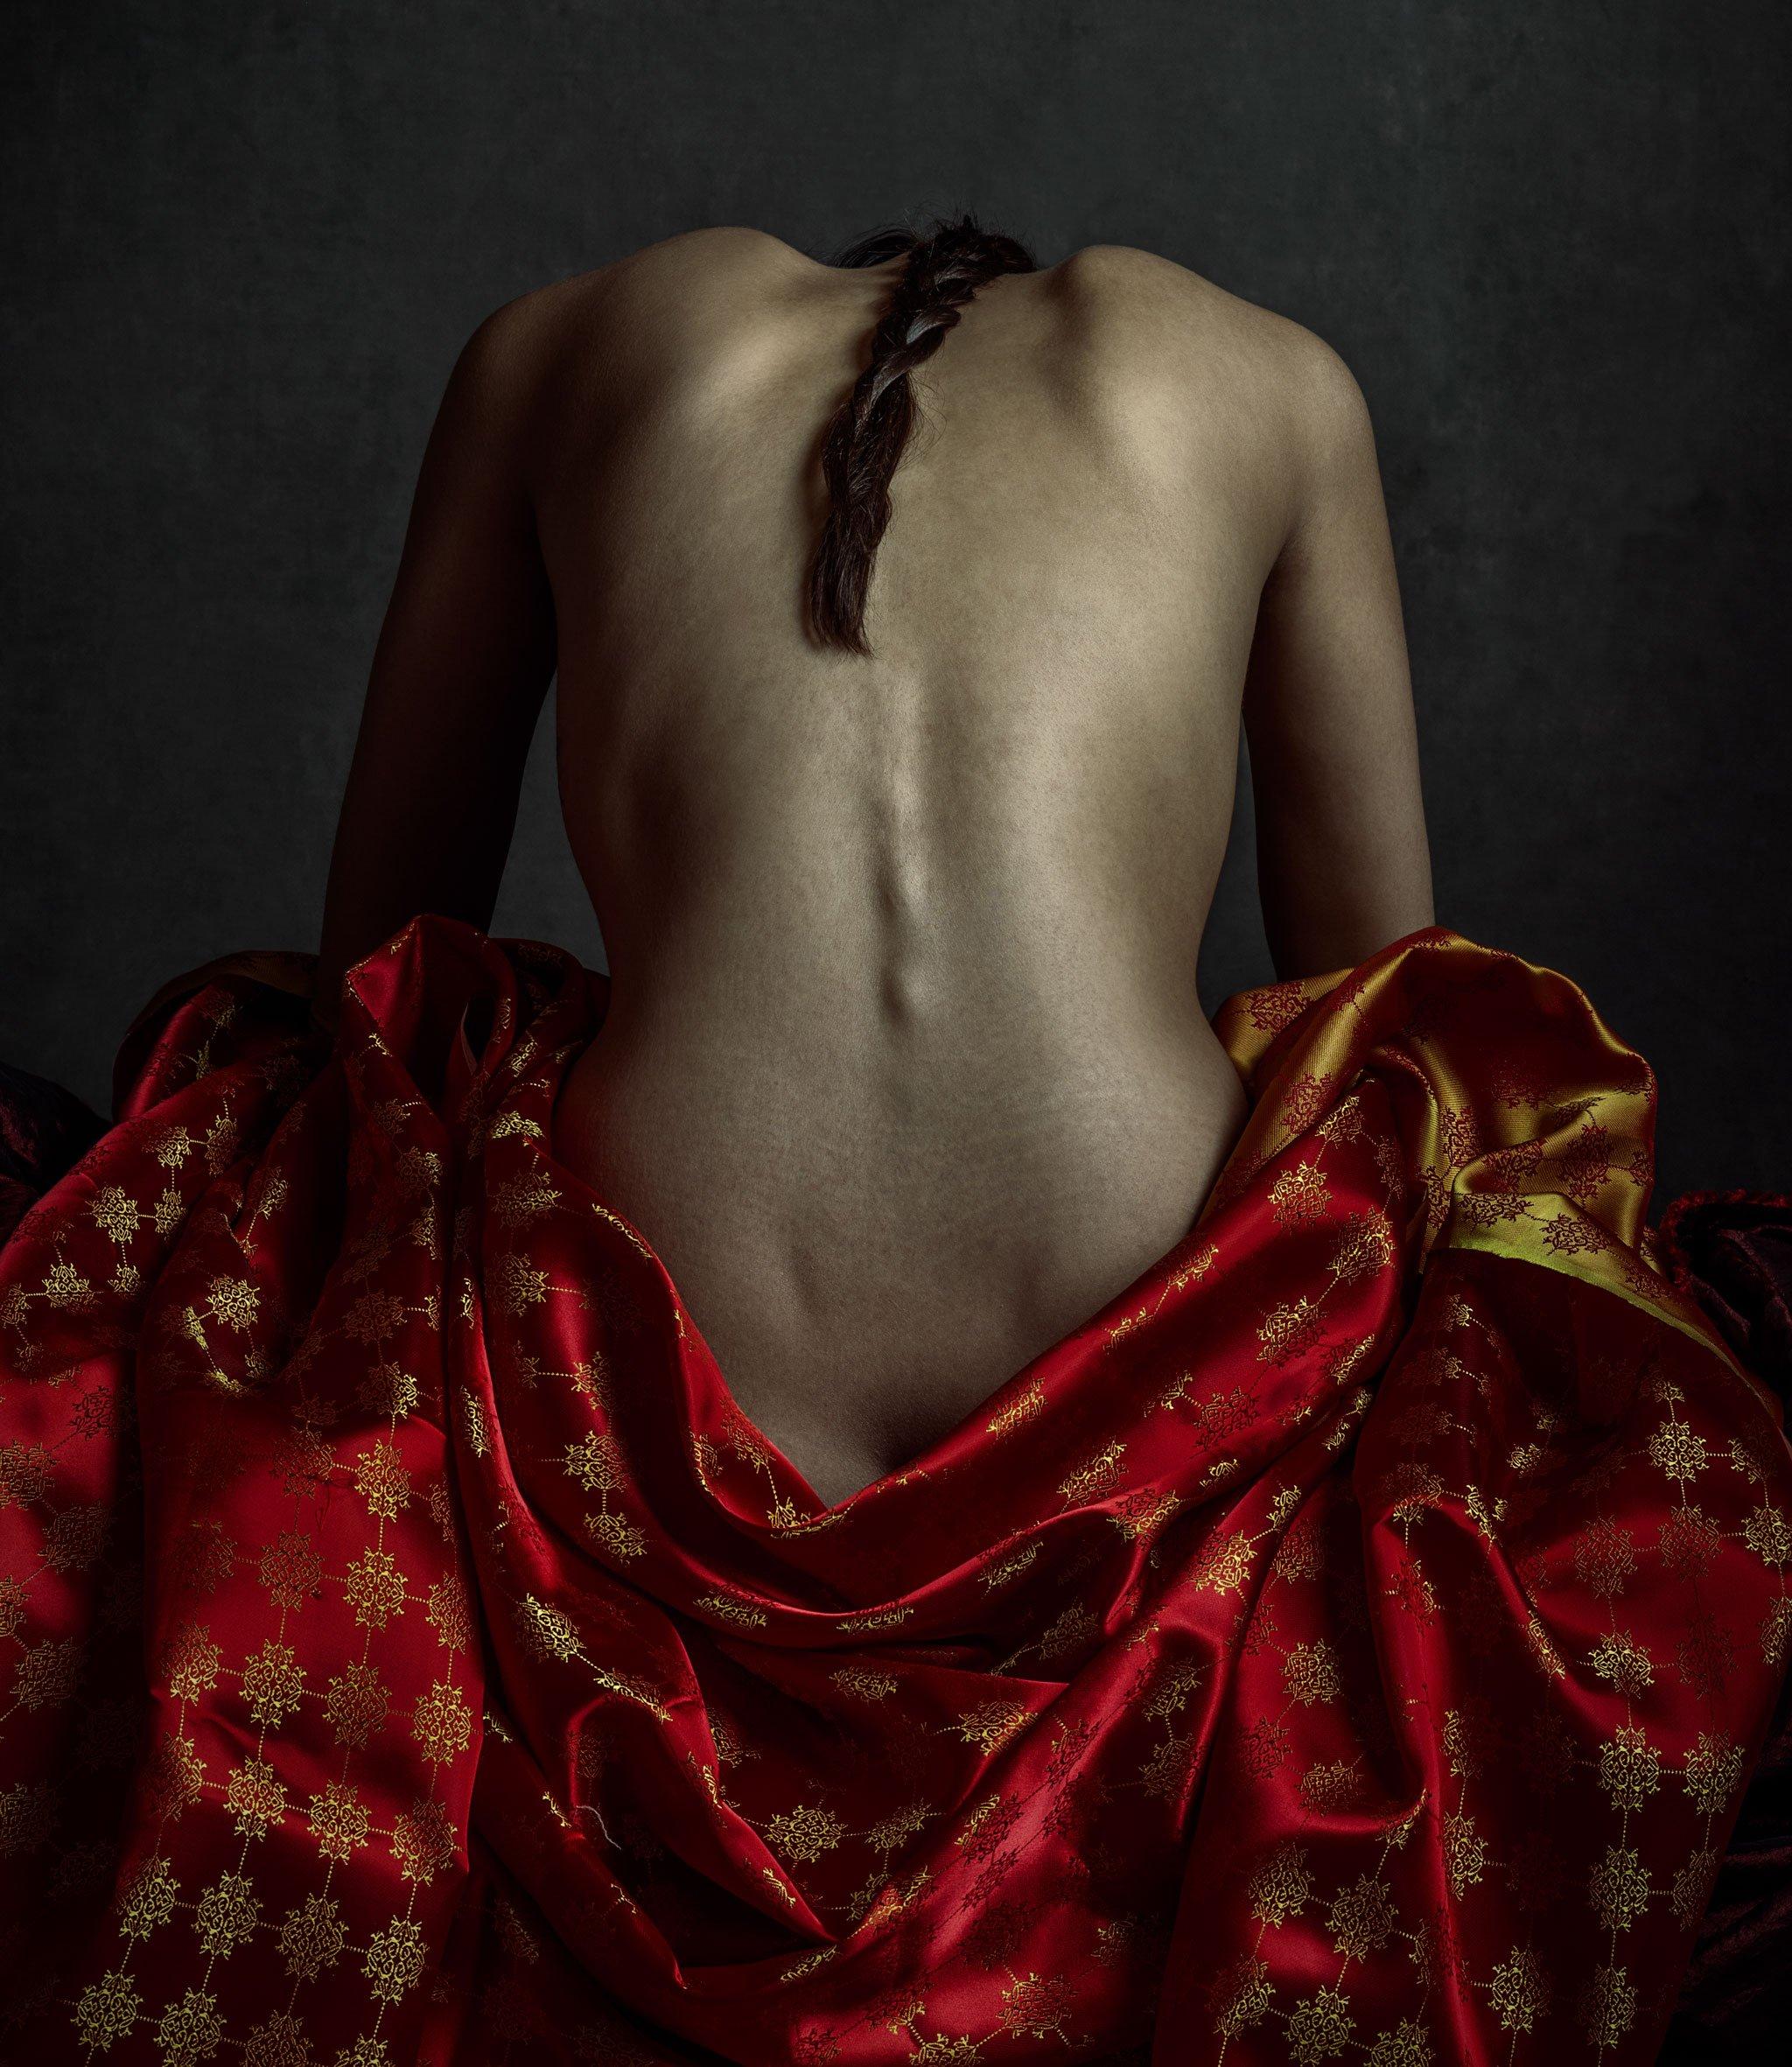 Photo by Samira Sabulis